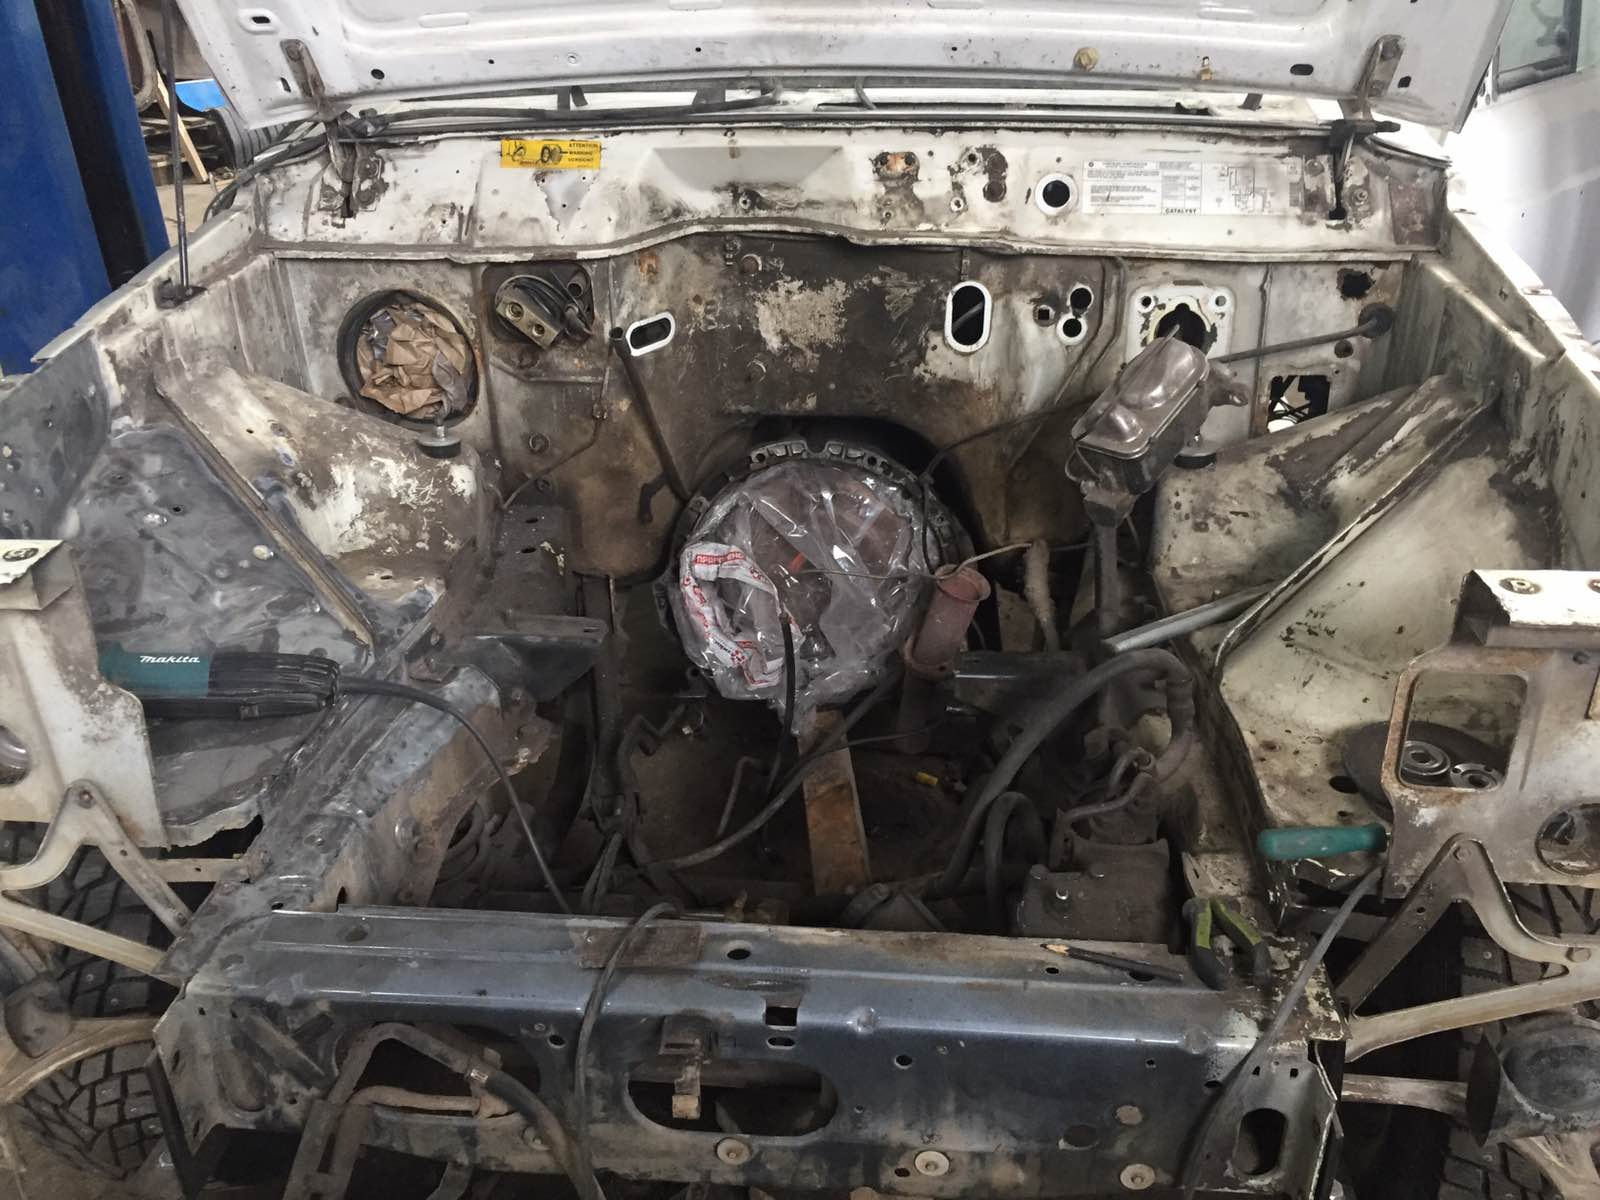 Джип Чероки/Jeep Cherokee Wagoneer XJ - Восстановление - до